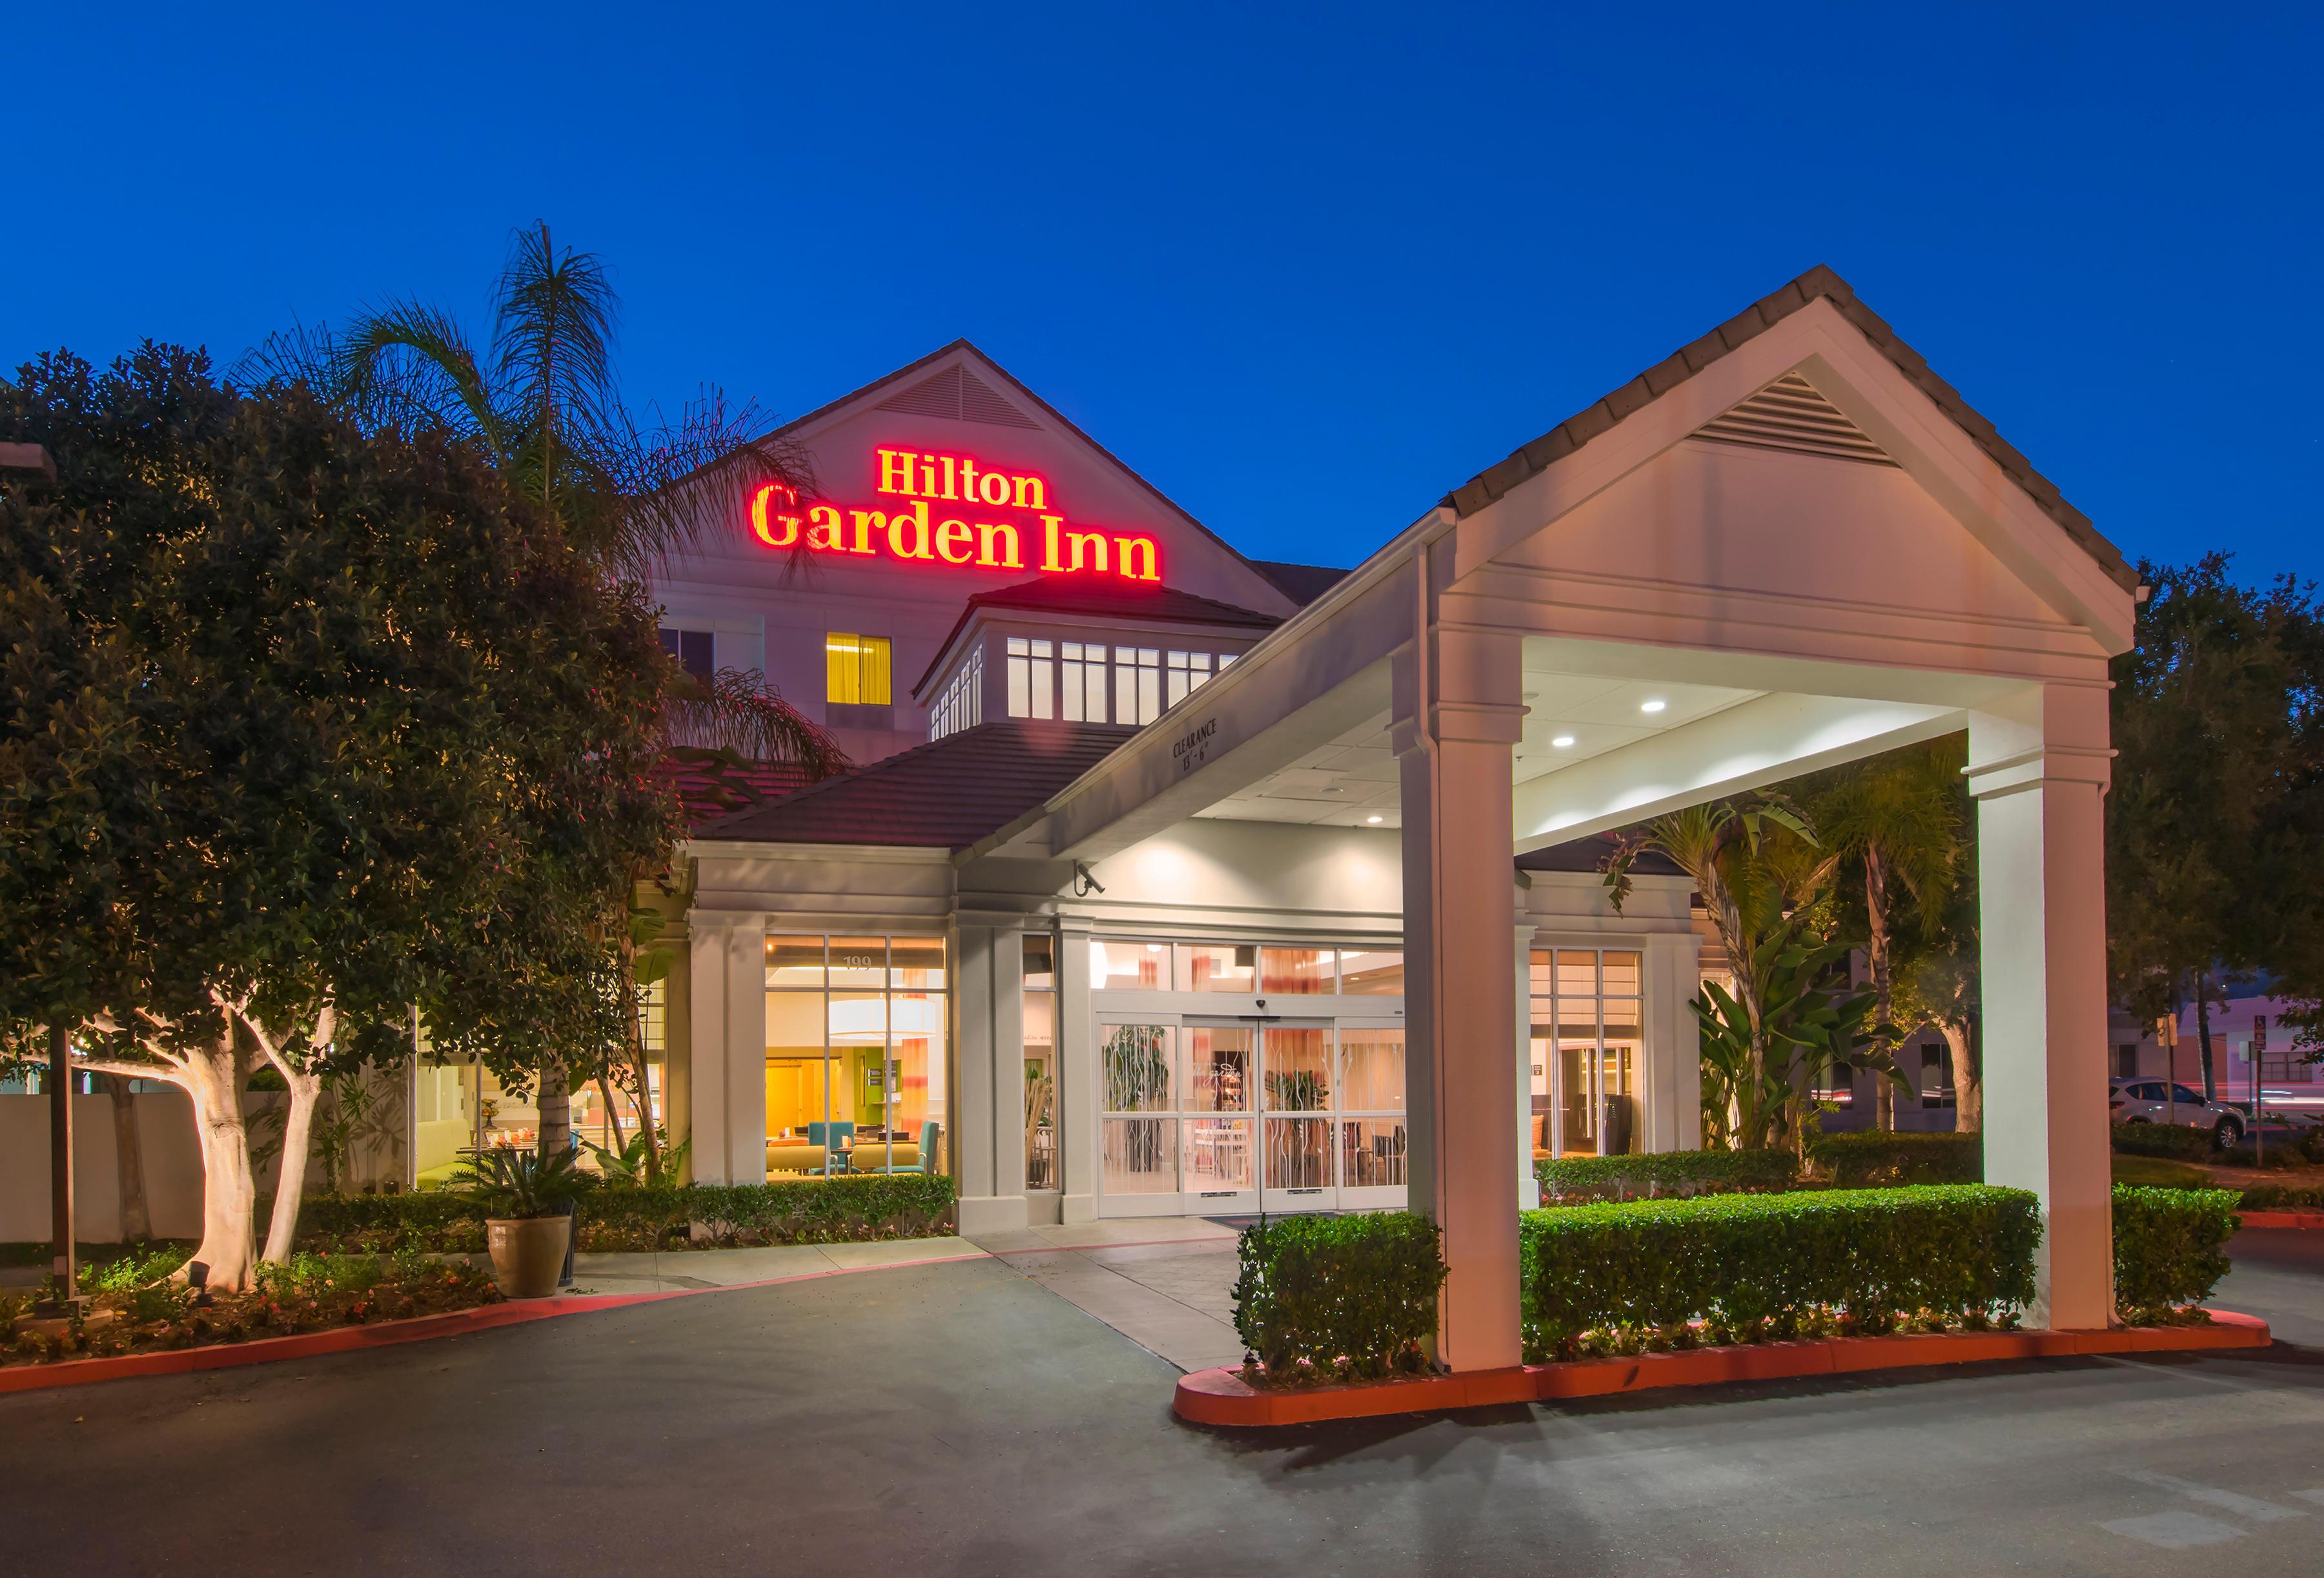 Hilton Garden Inn Arcadia Pasadena Area Arcadia